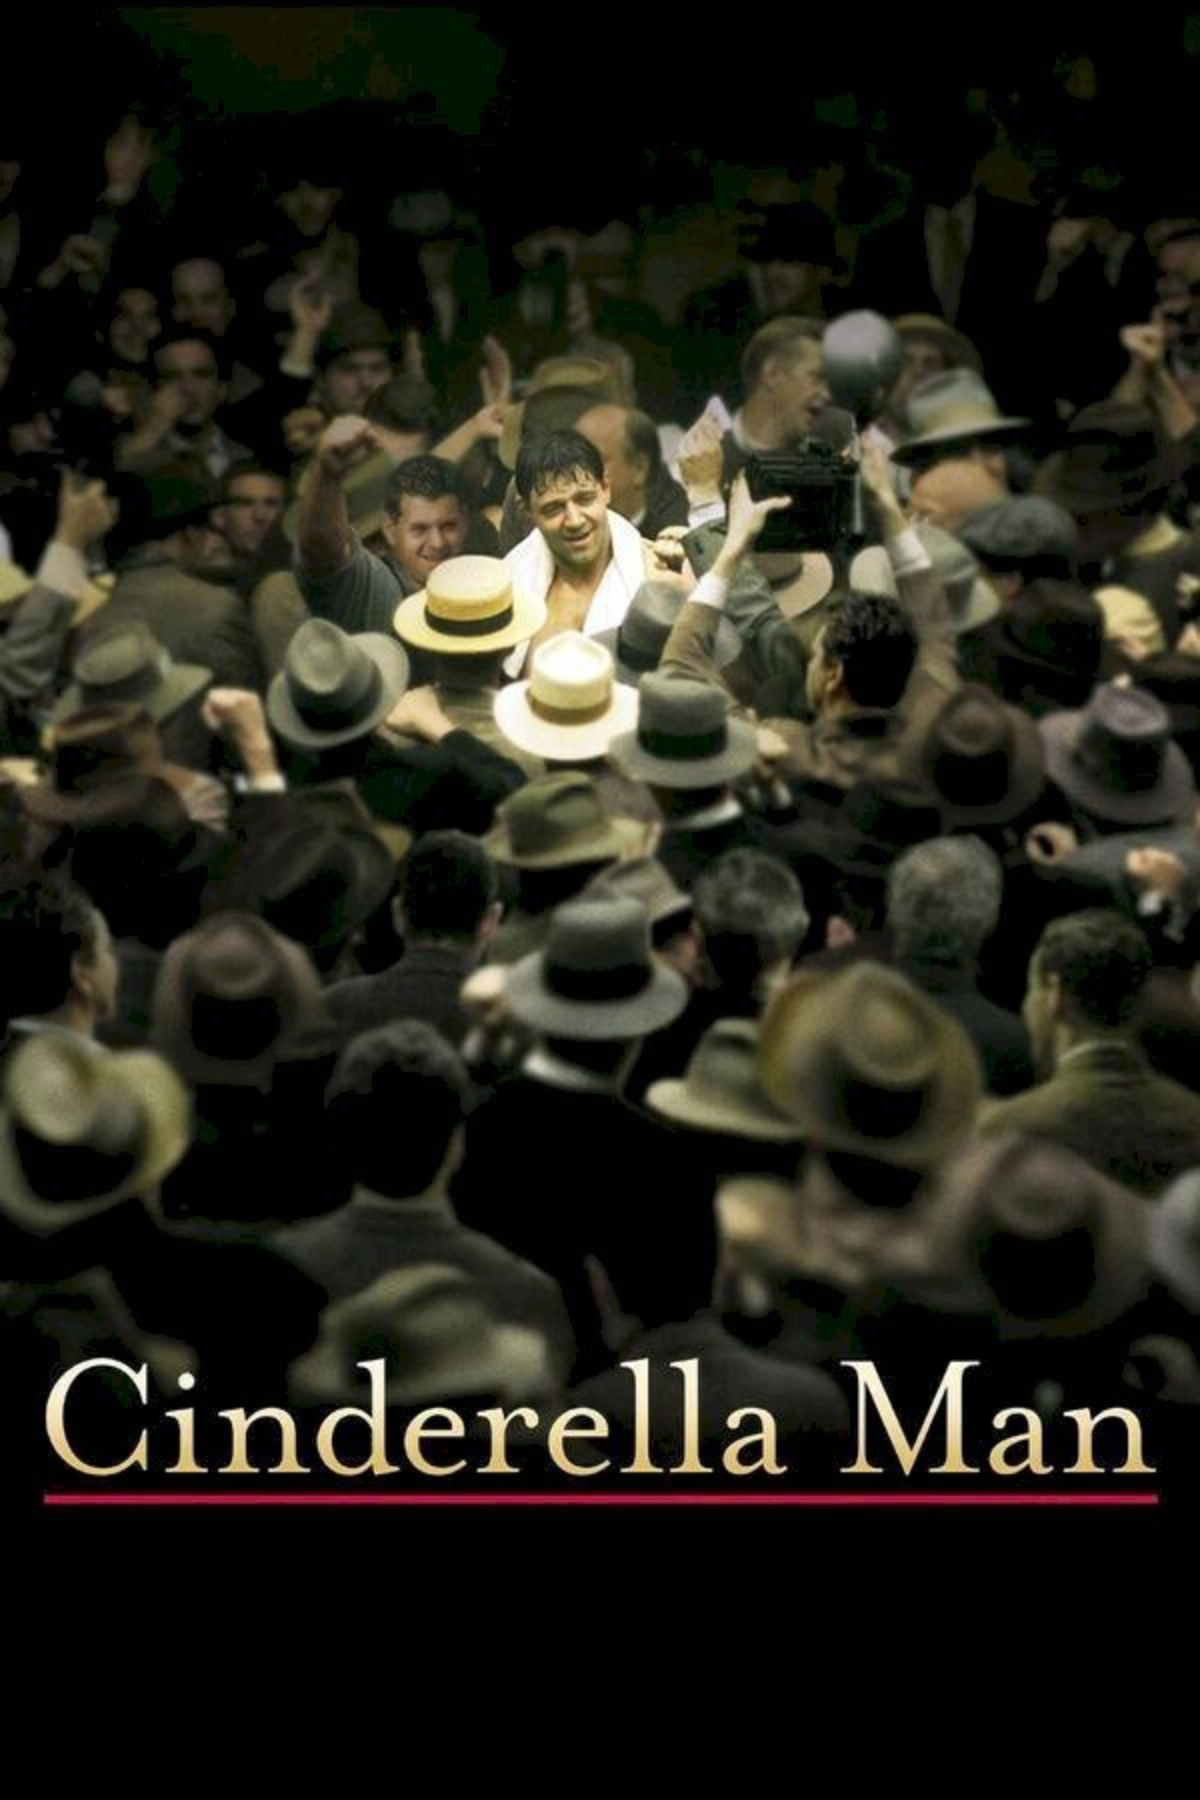 Cinderella Man image